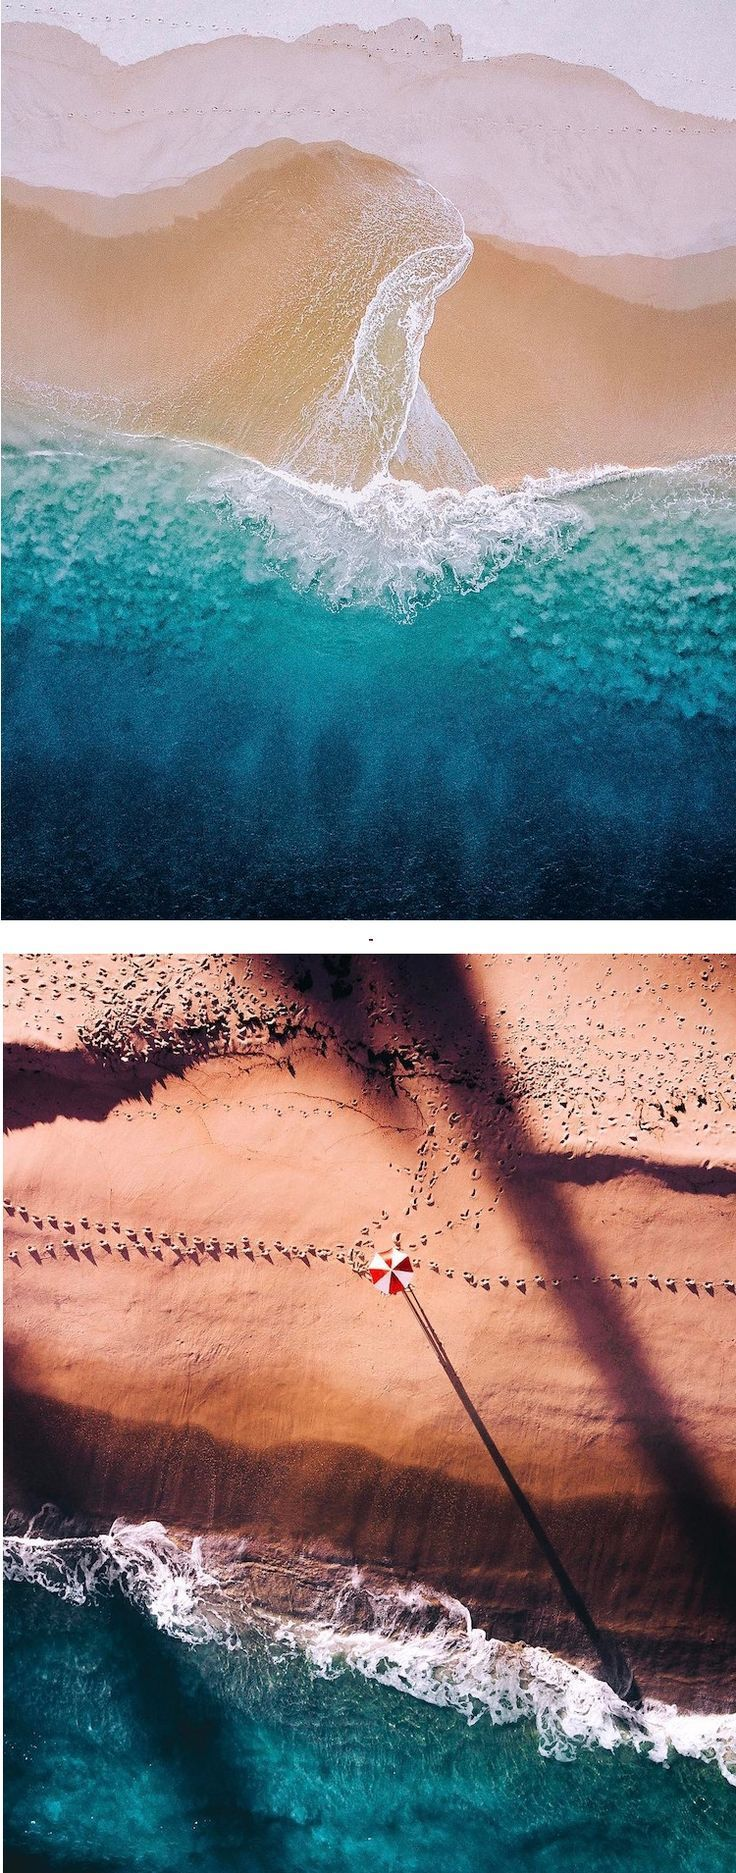 Photographer Bo Le captures stunning photos of South Australia #dronephotography #aerialphotography #naturephoto #birdseyeview